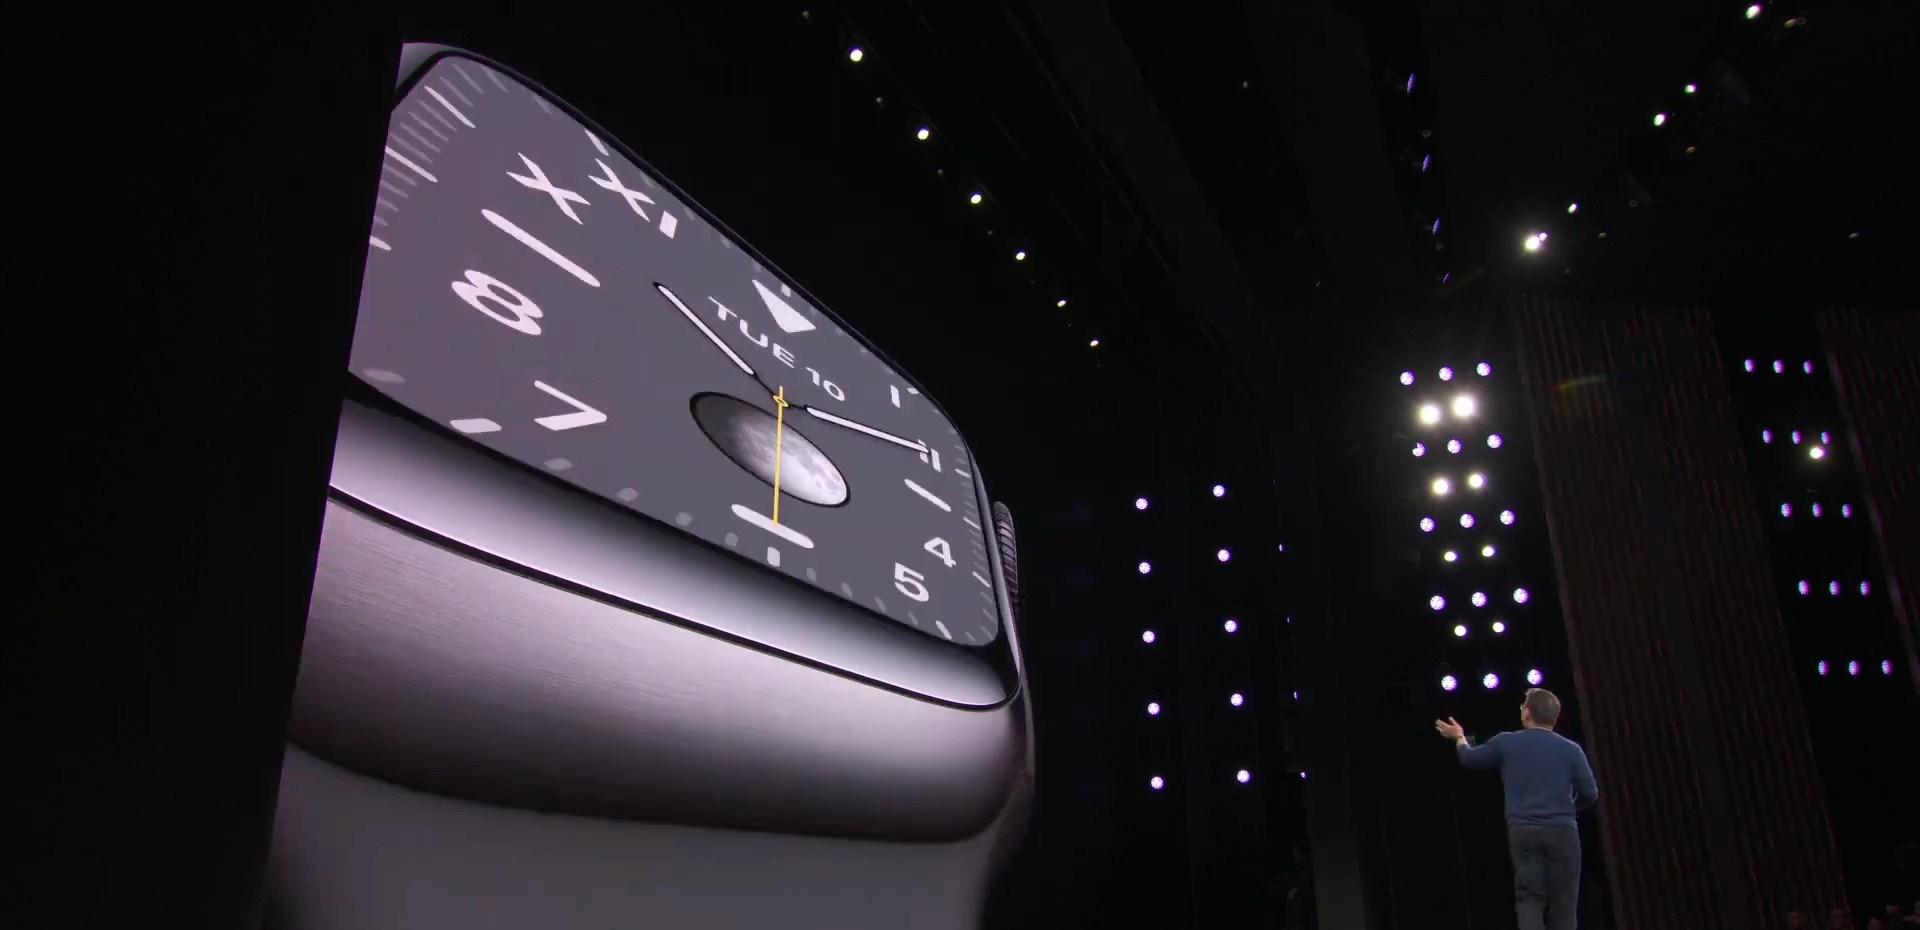 Apple Watch Series 5 鈦合金版本